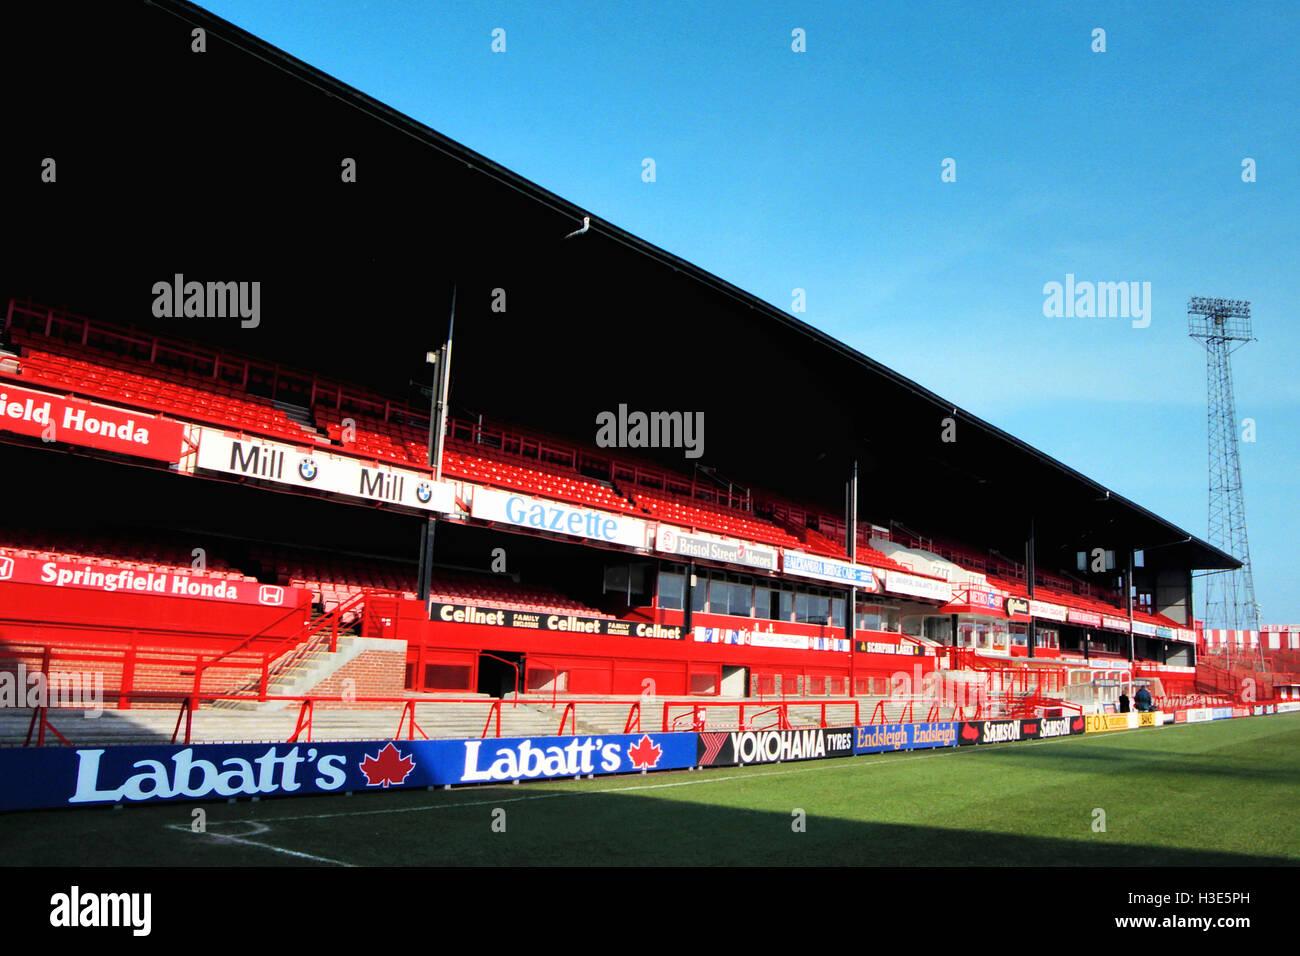 Roker Park, home of Sunderland AFC, pictured in April 1996 - Stock Image